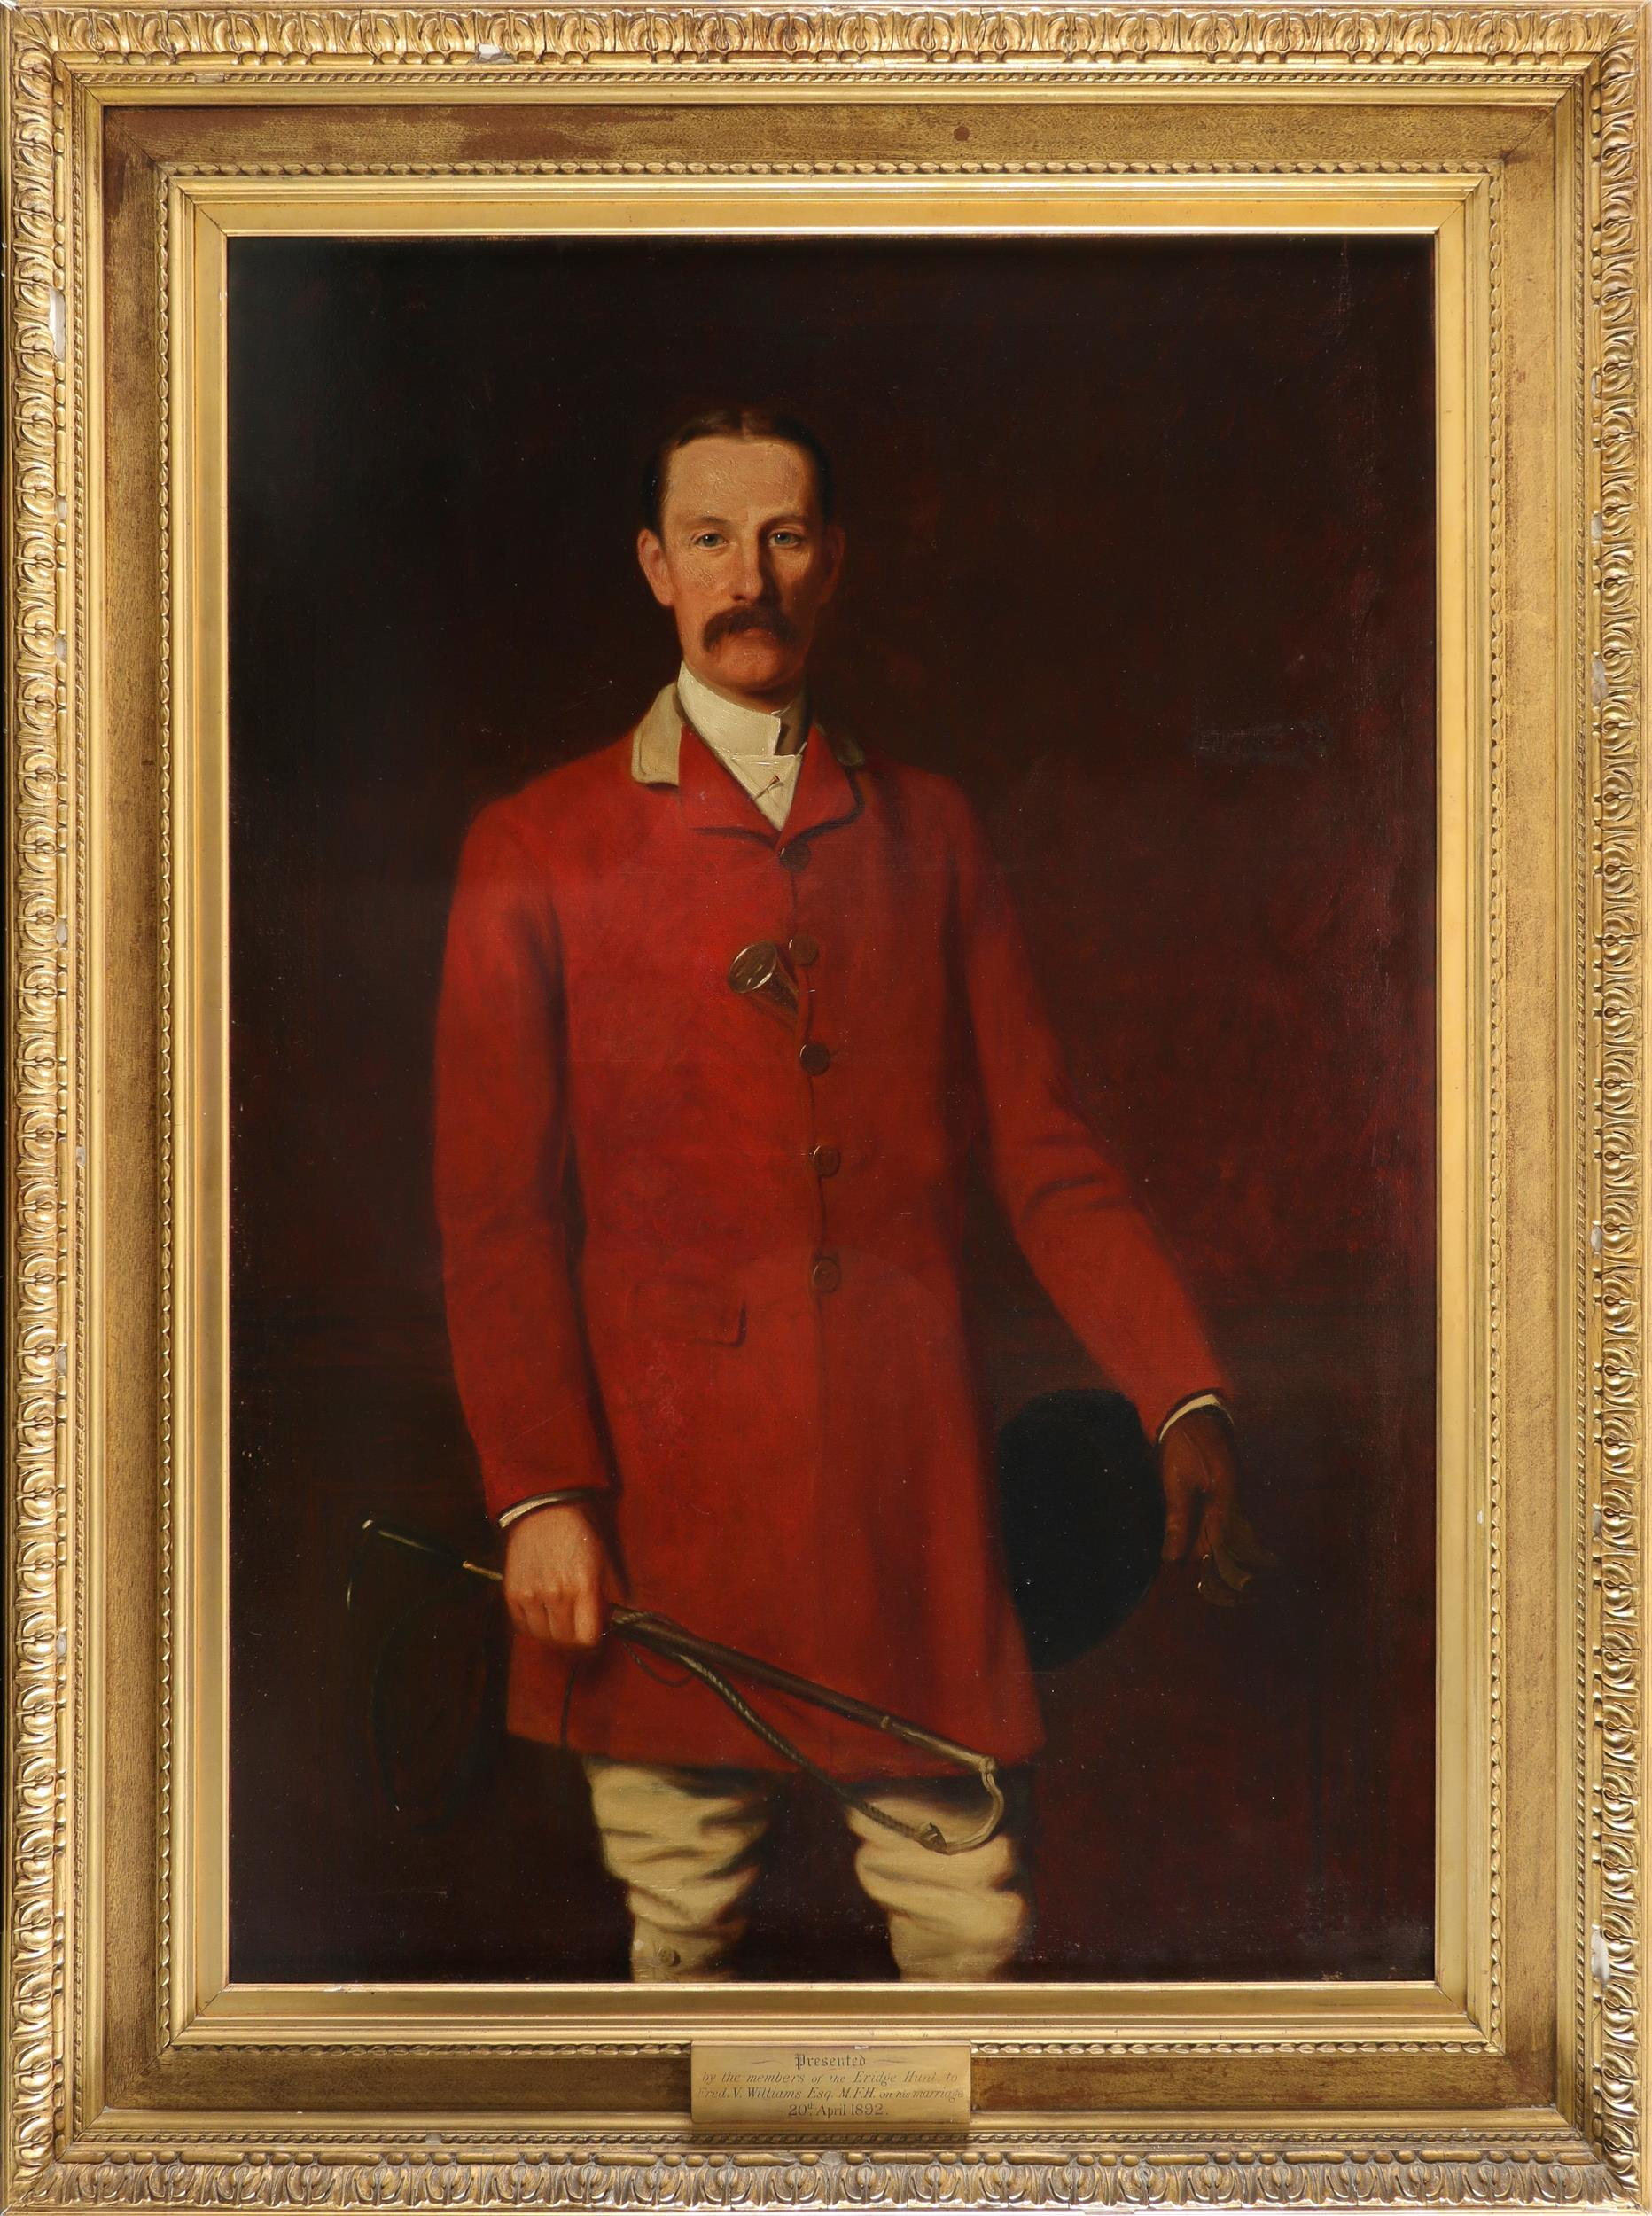 Joseph Sydney Willis Hodges (1828-1900) Portrait of Frederick Vernon Williams, Master of the - Image 2 of 3